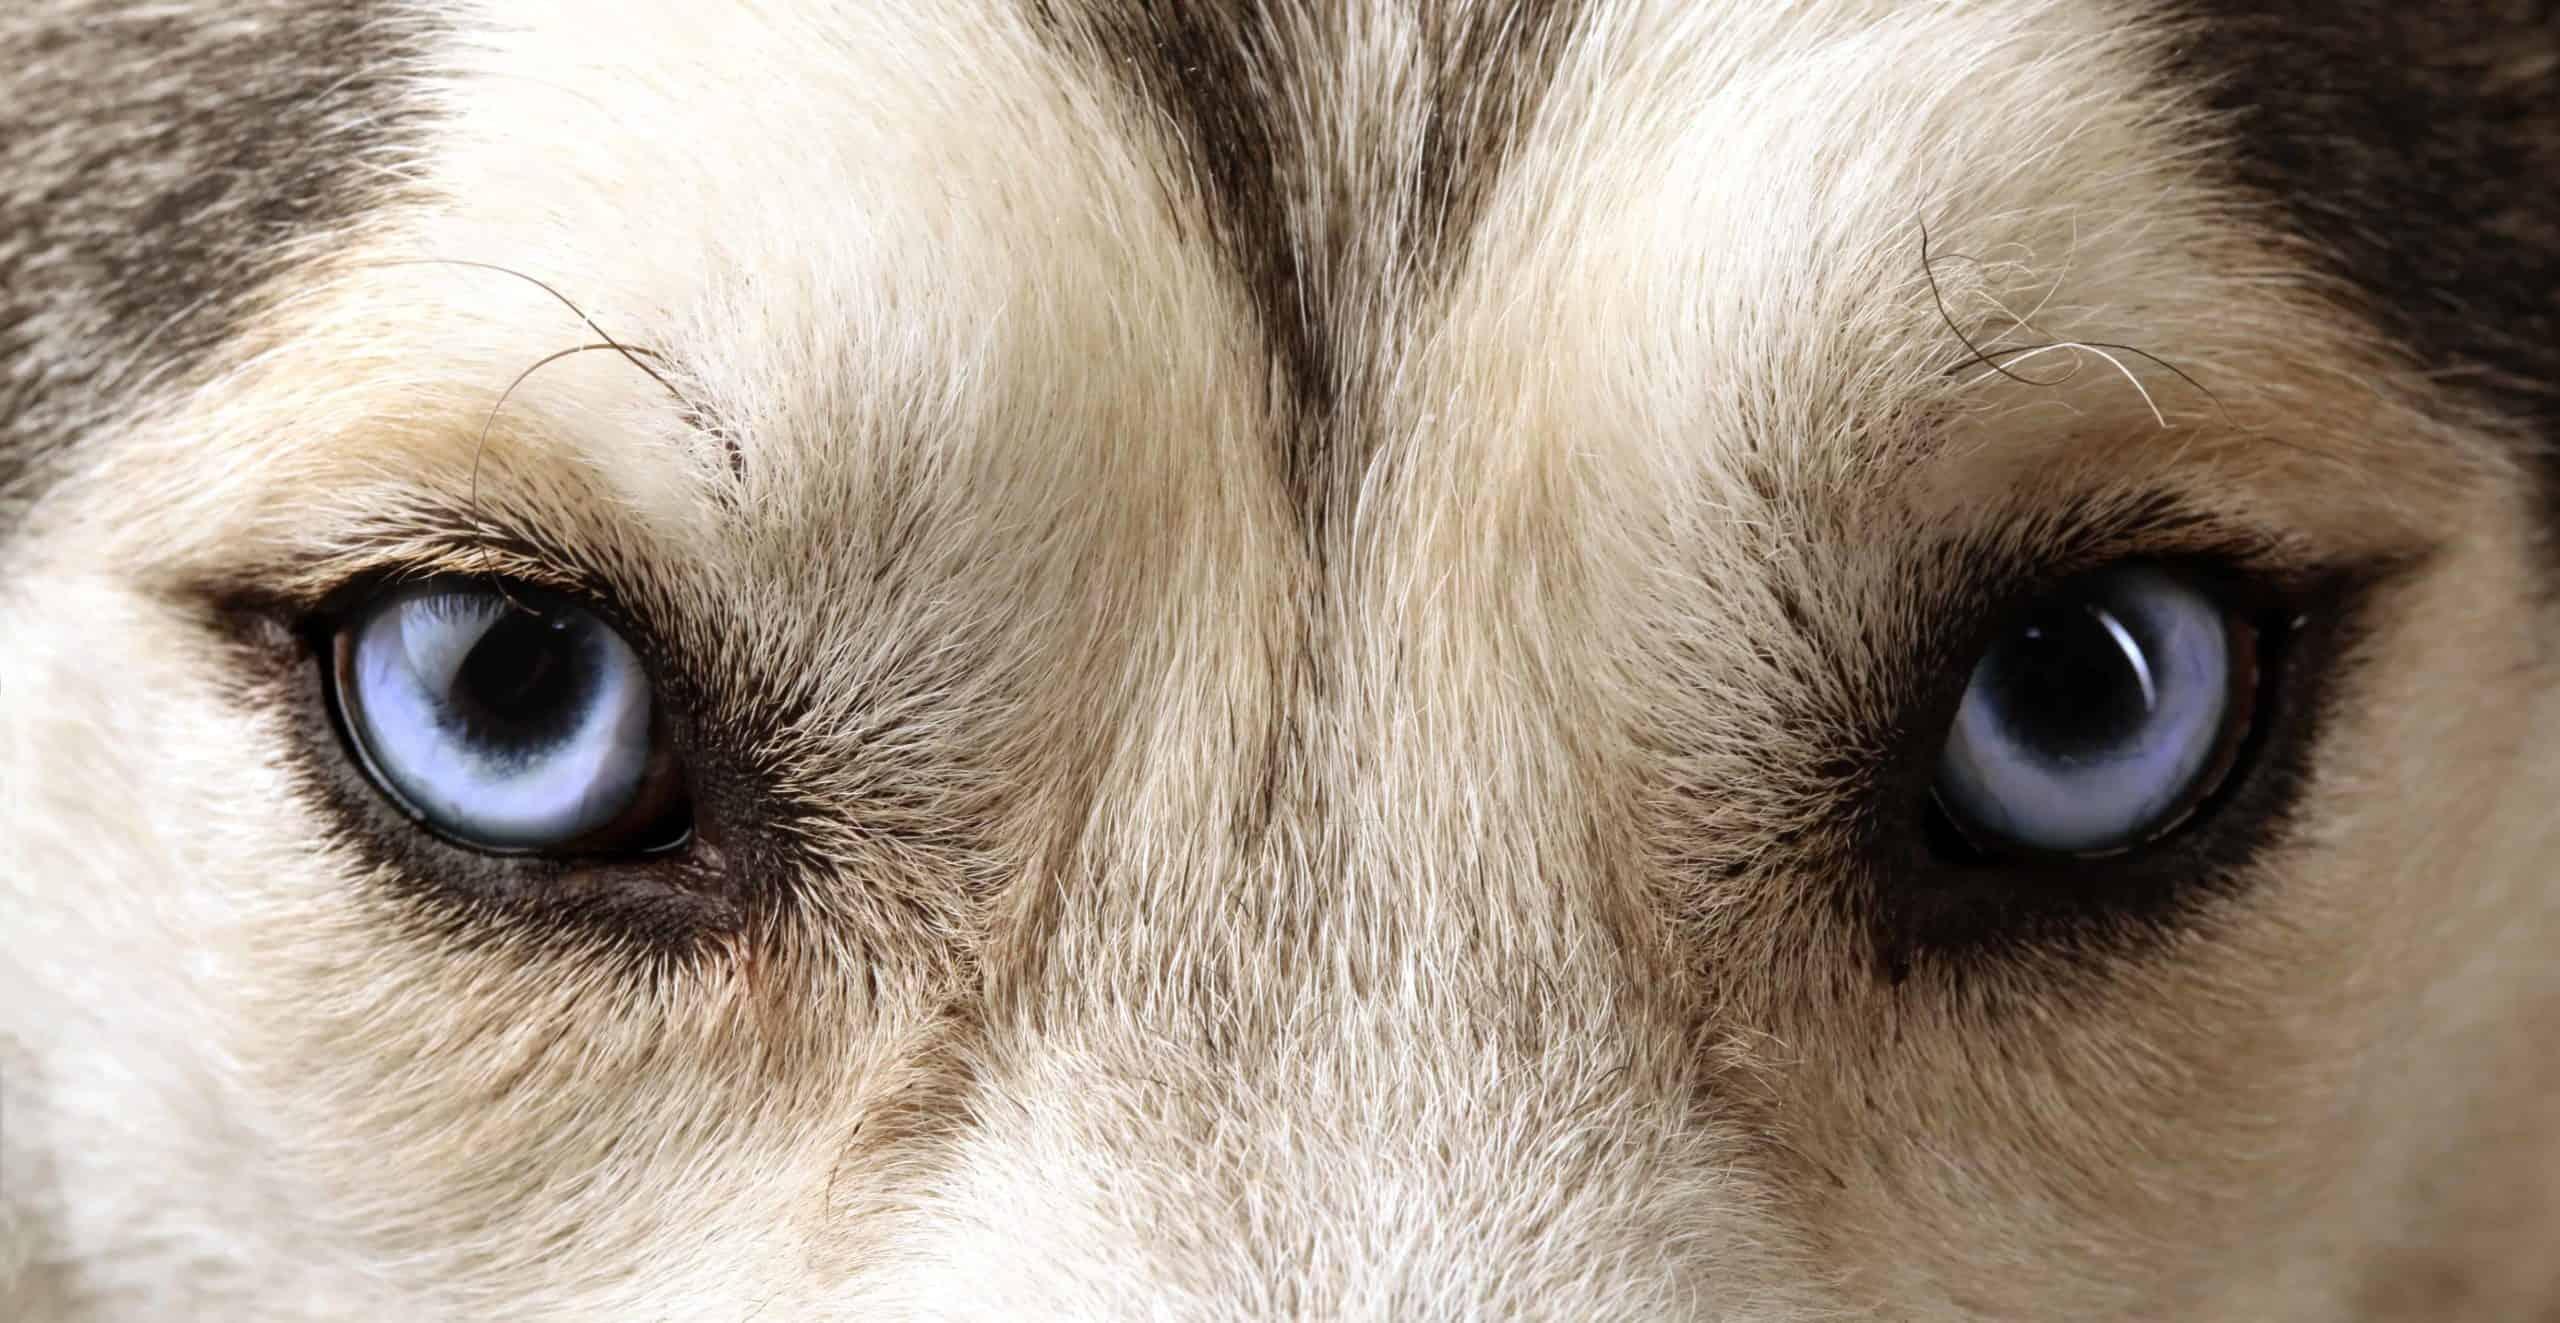 Closeup image of a Husky's eyes.